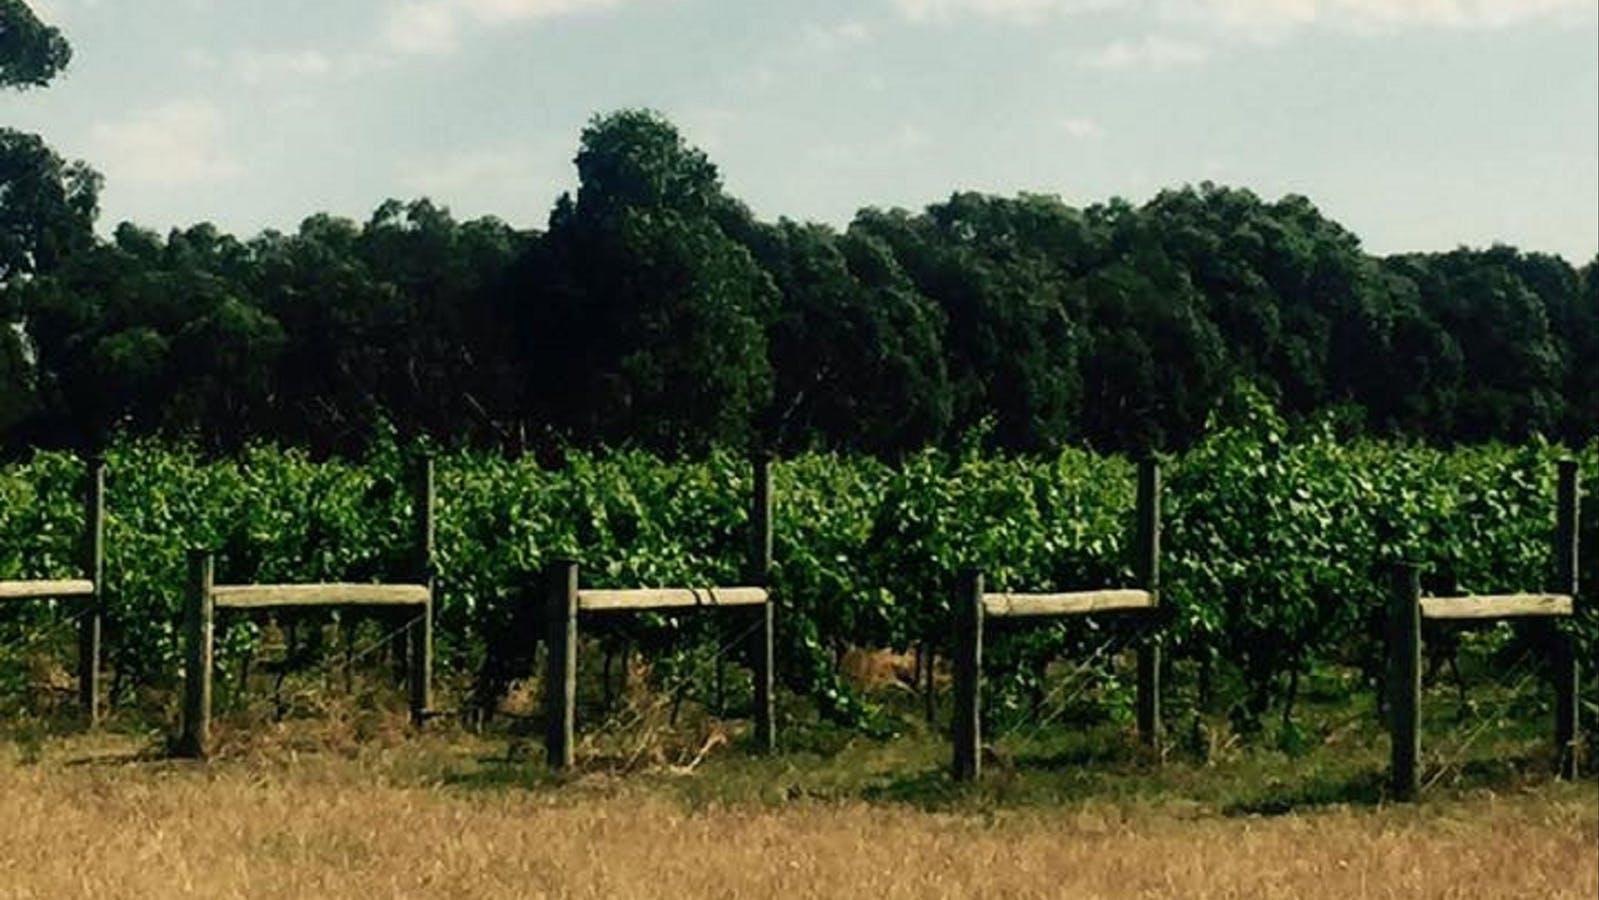 Banks Road Vineyards